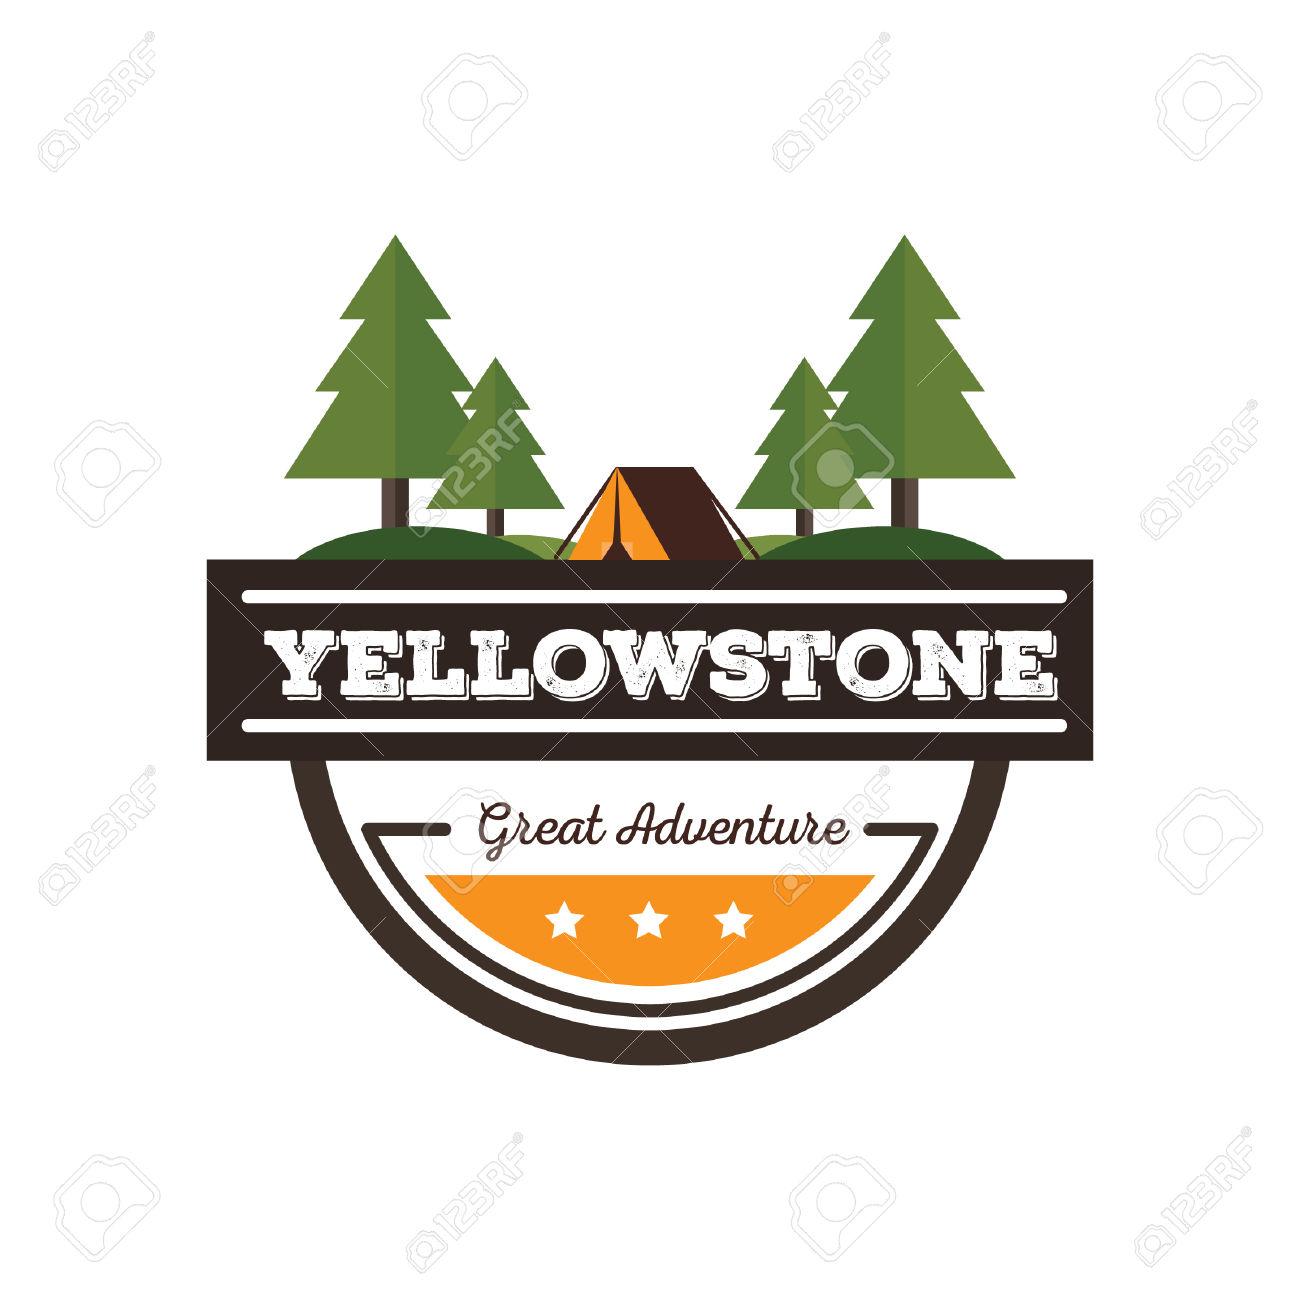 Yellowstone clipart.